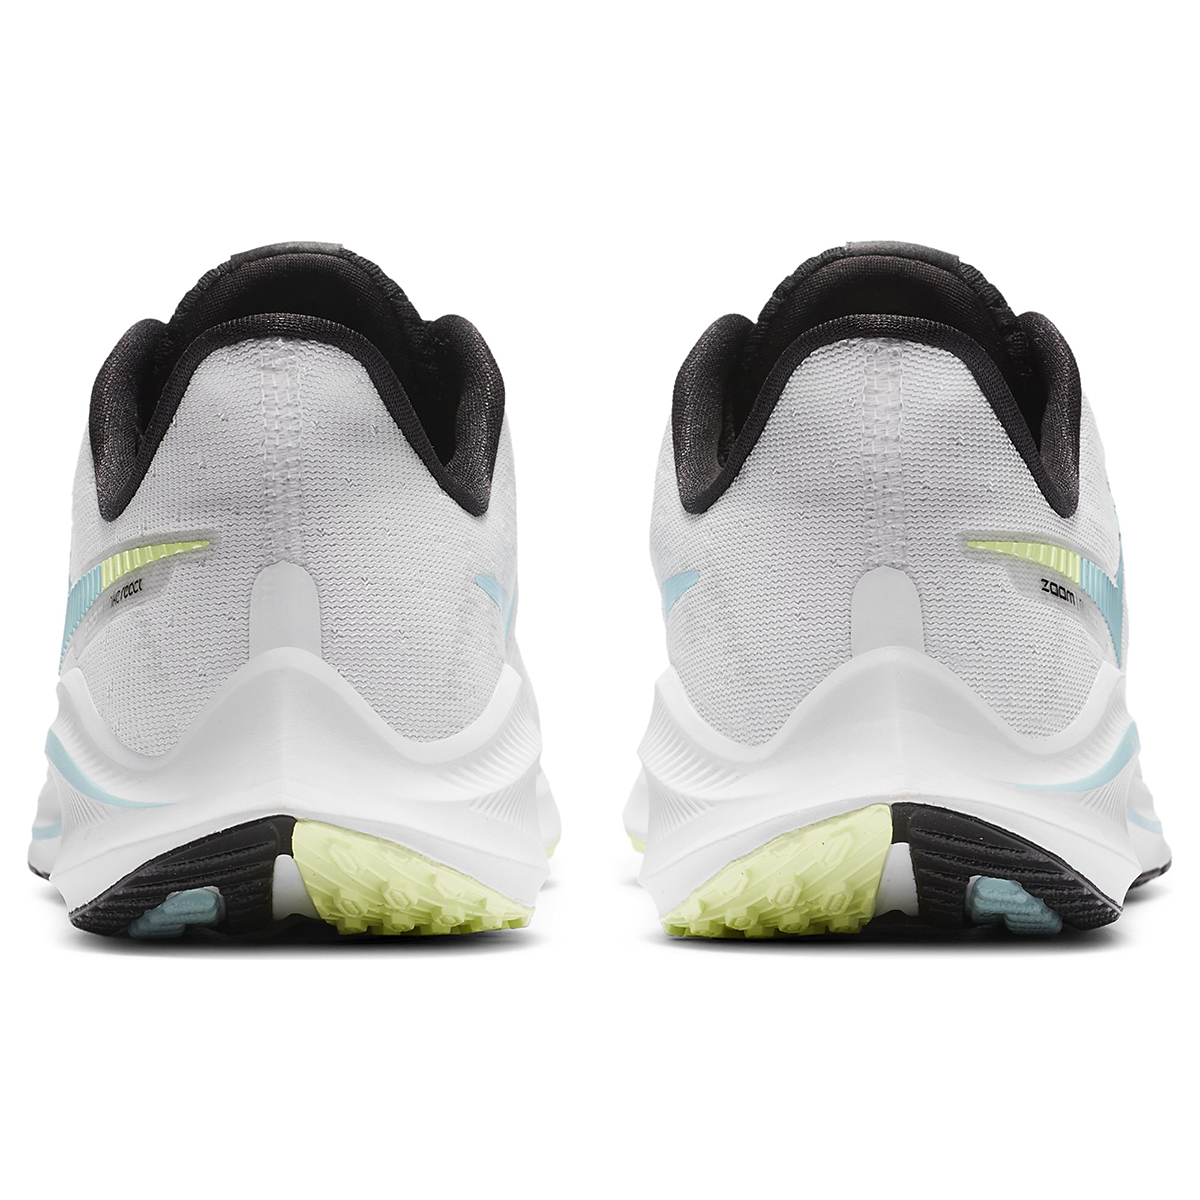 Women's Nike Vomero 14 Running Shoe - Color: White/Glacier Ice-Black-Pure Platinum - Size: 5 - Width: Regular, White/Glacier Ice-Black-Pure Platinum, large, image 5